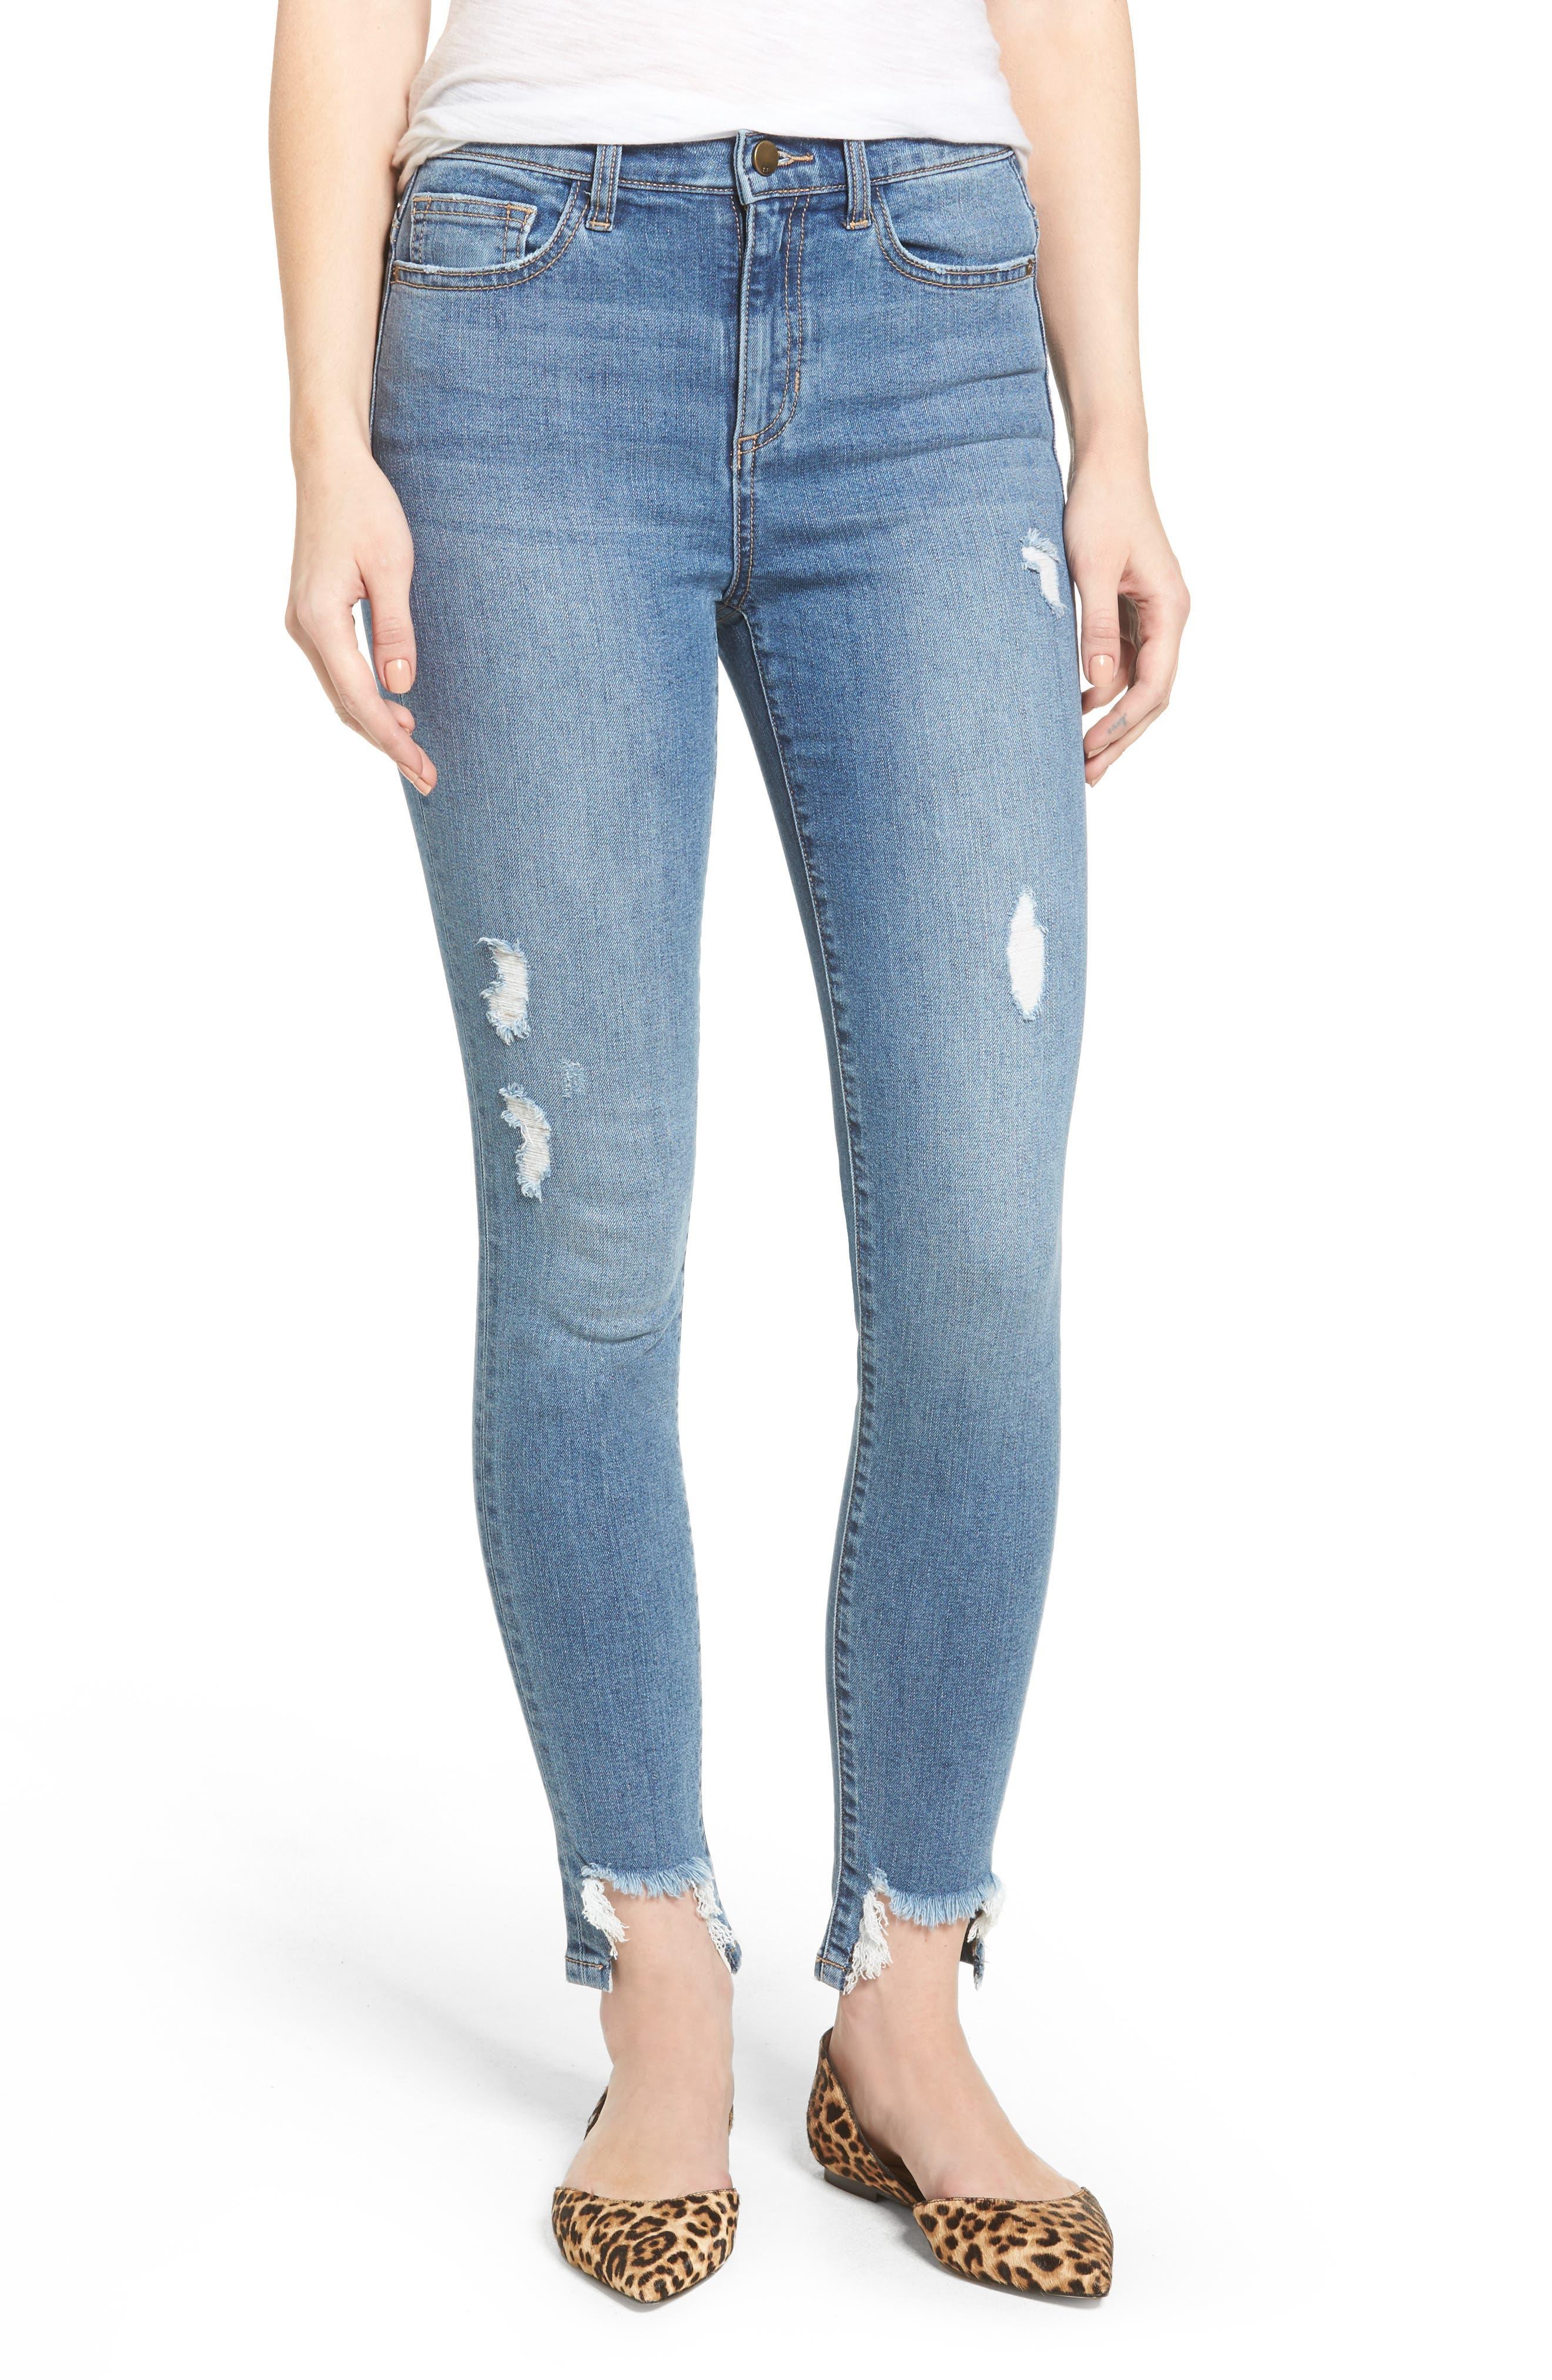 Alternate Image 1 Selected - SP Black High Waist Raw Step Hem Jeans